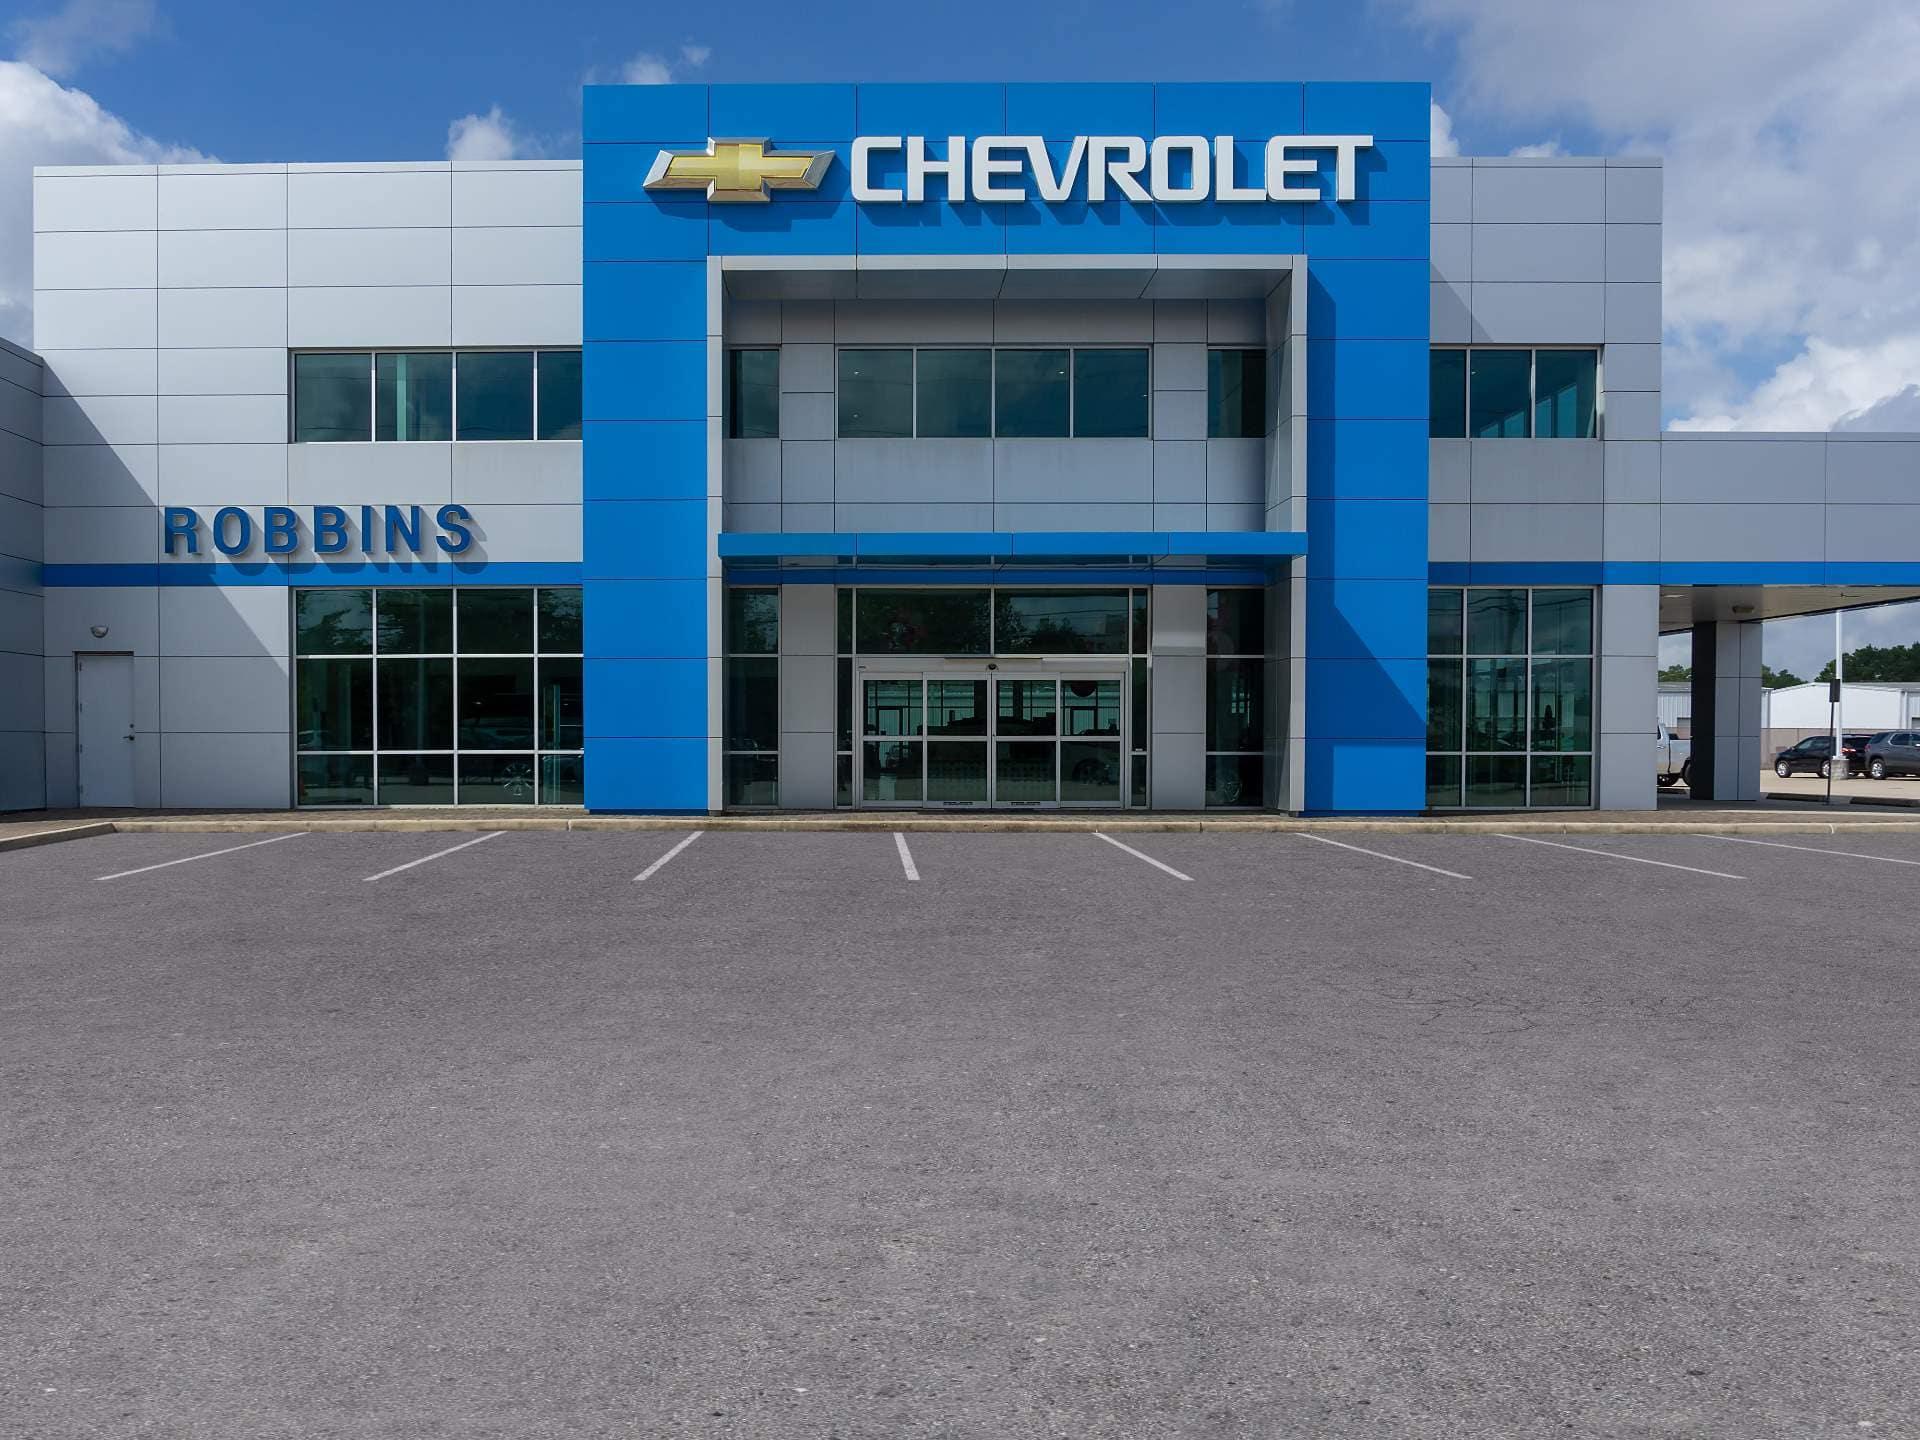 An exterior shot of a Chevrolet dealership at night.